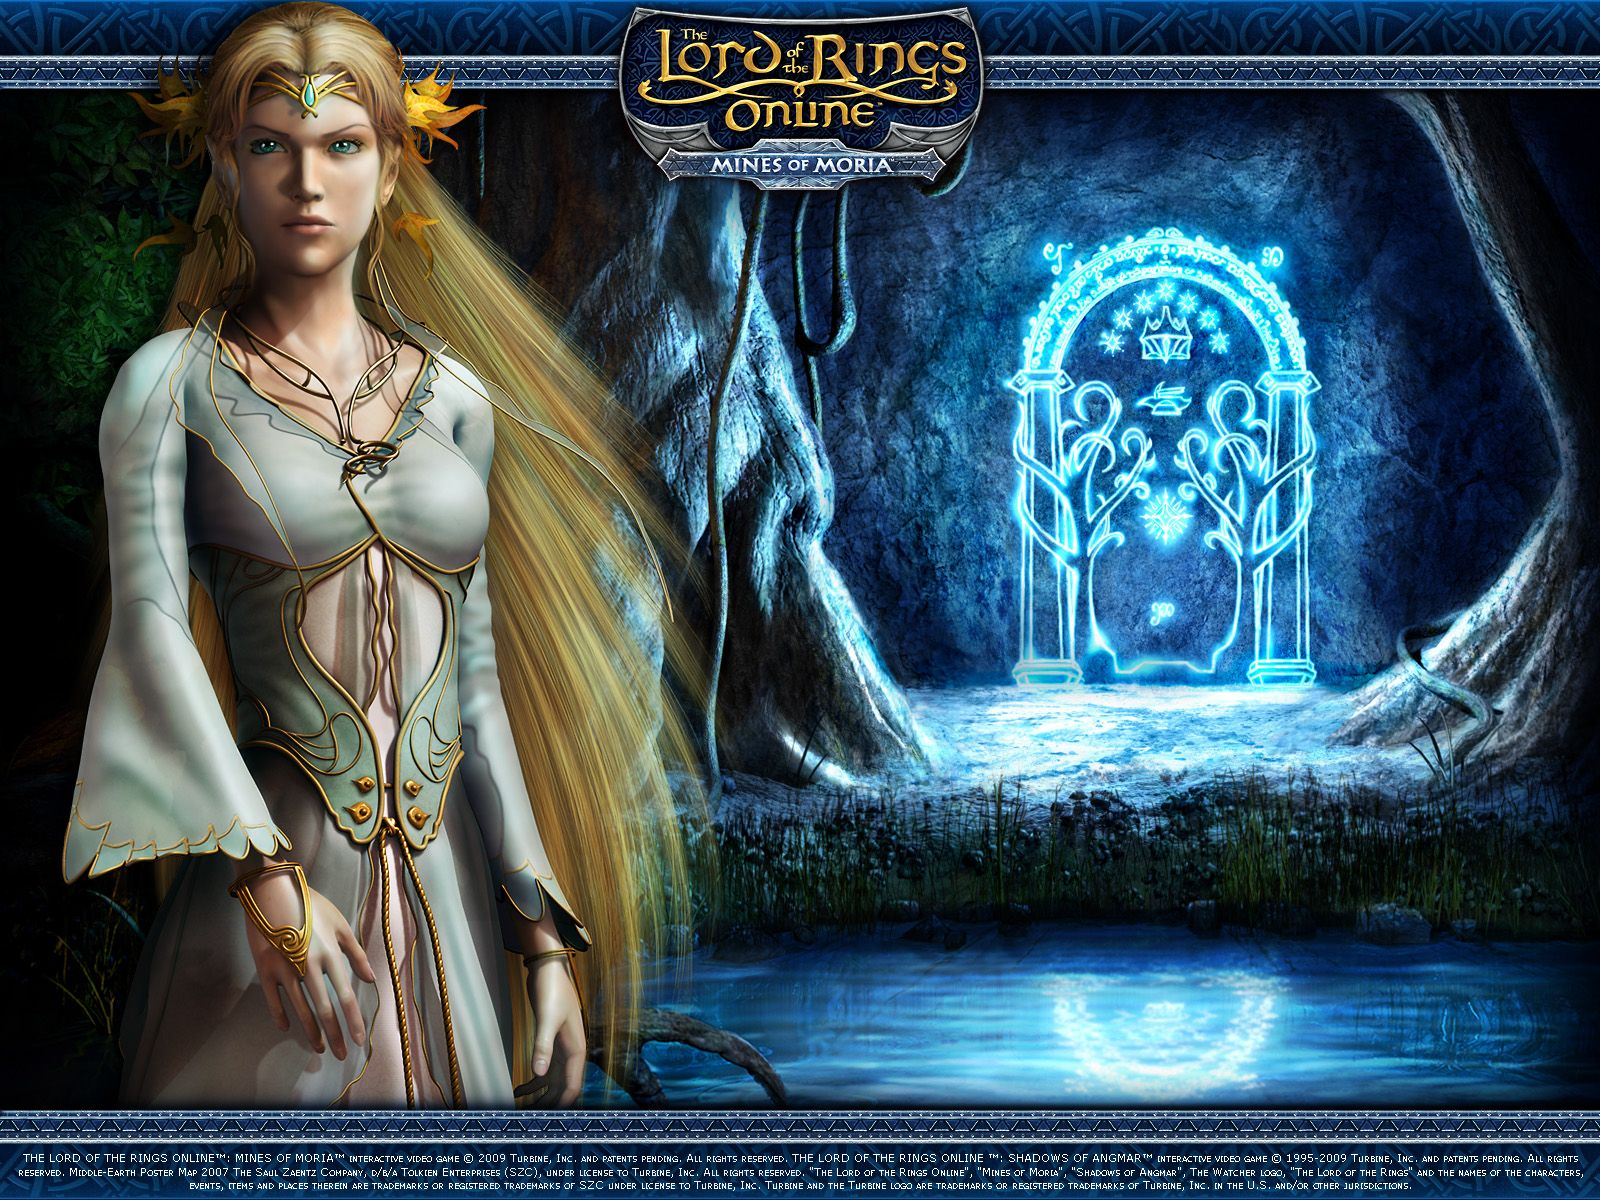 Lord Of The Rings Online Ofcourse I Have A Lifetime Account El Senor De Los Anillos Senor Admirable